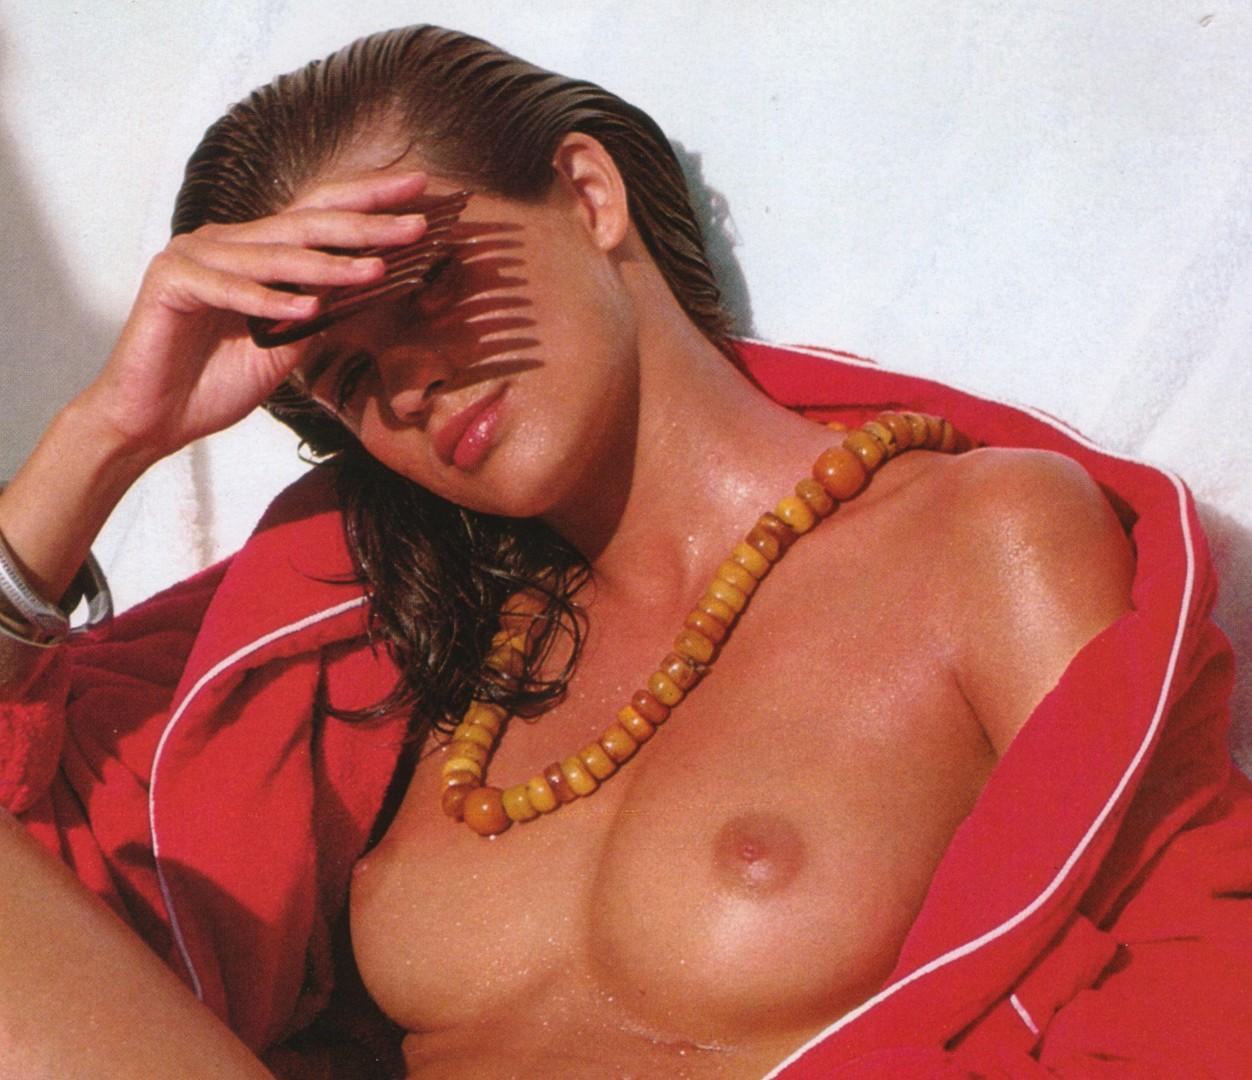 Carla gugino naked video